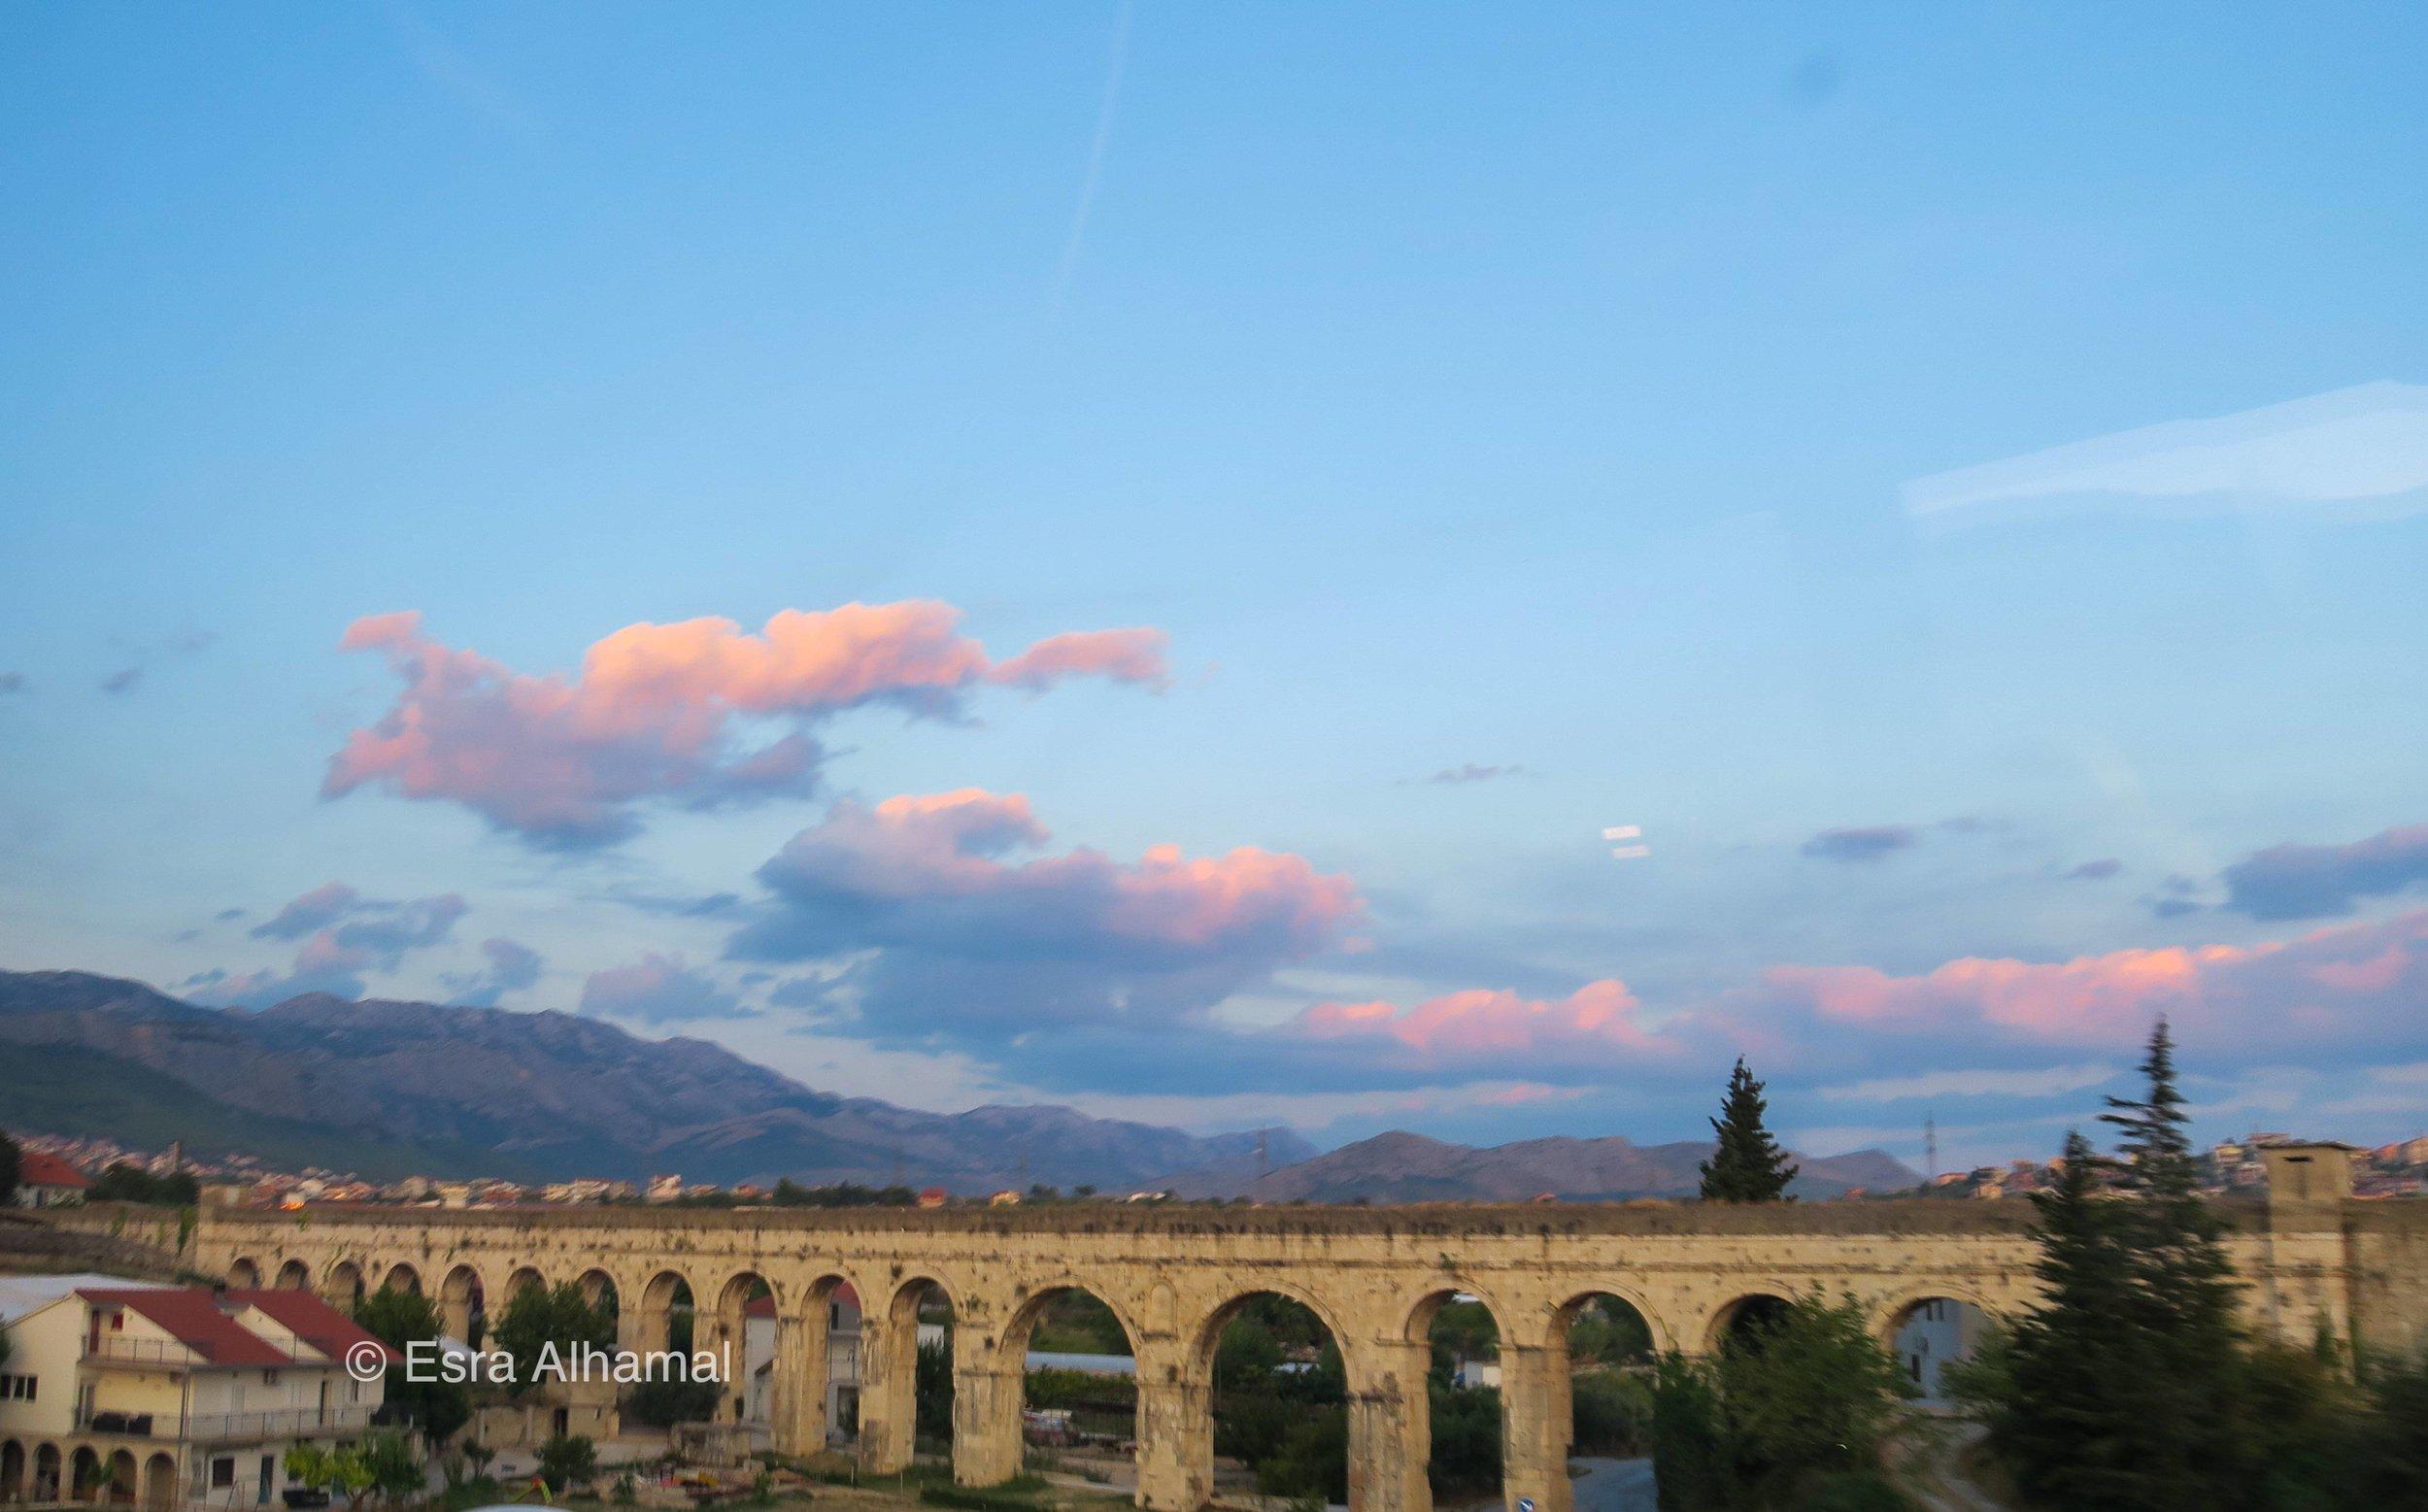 The sunset over the bridge in Split